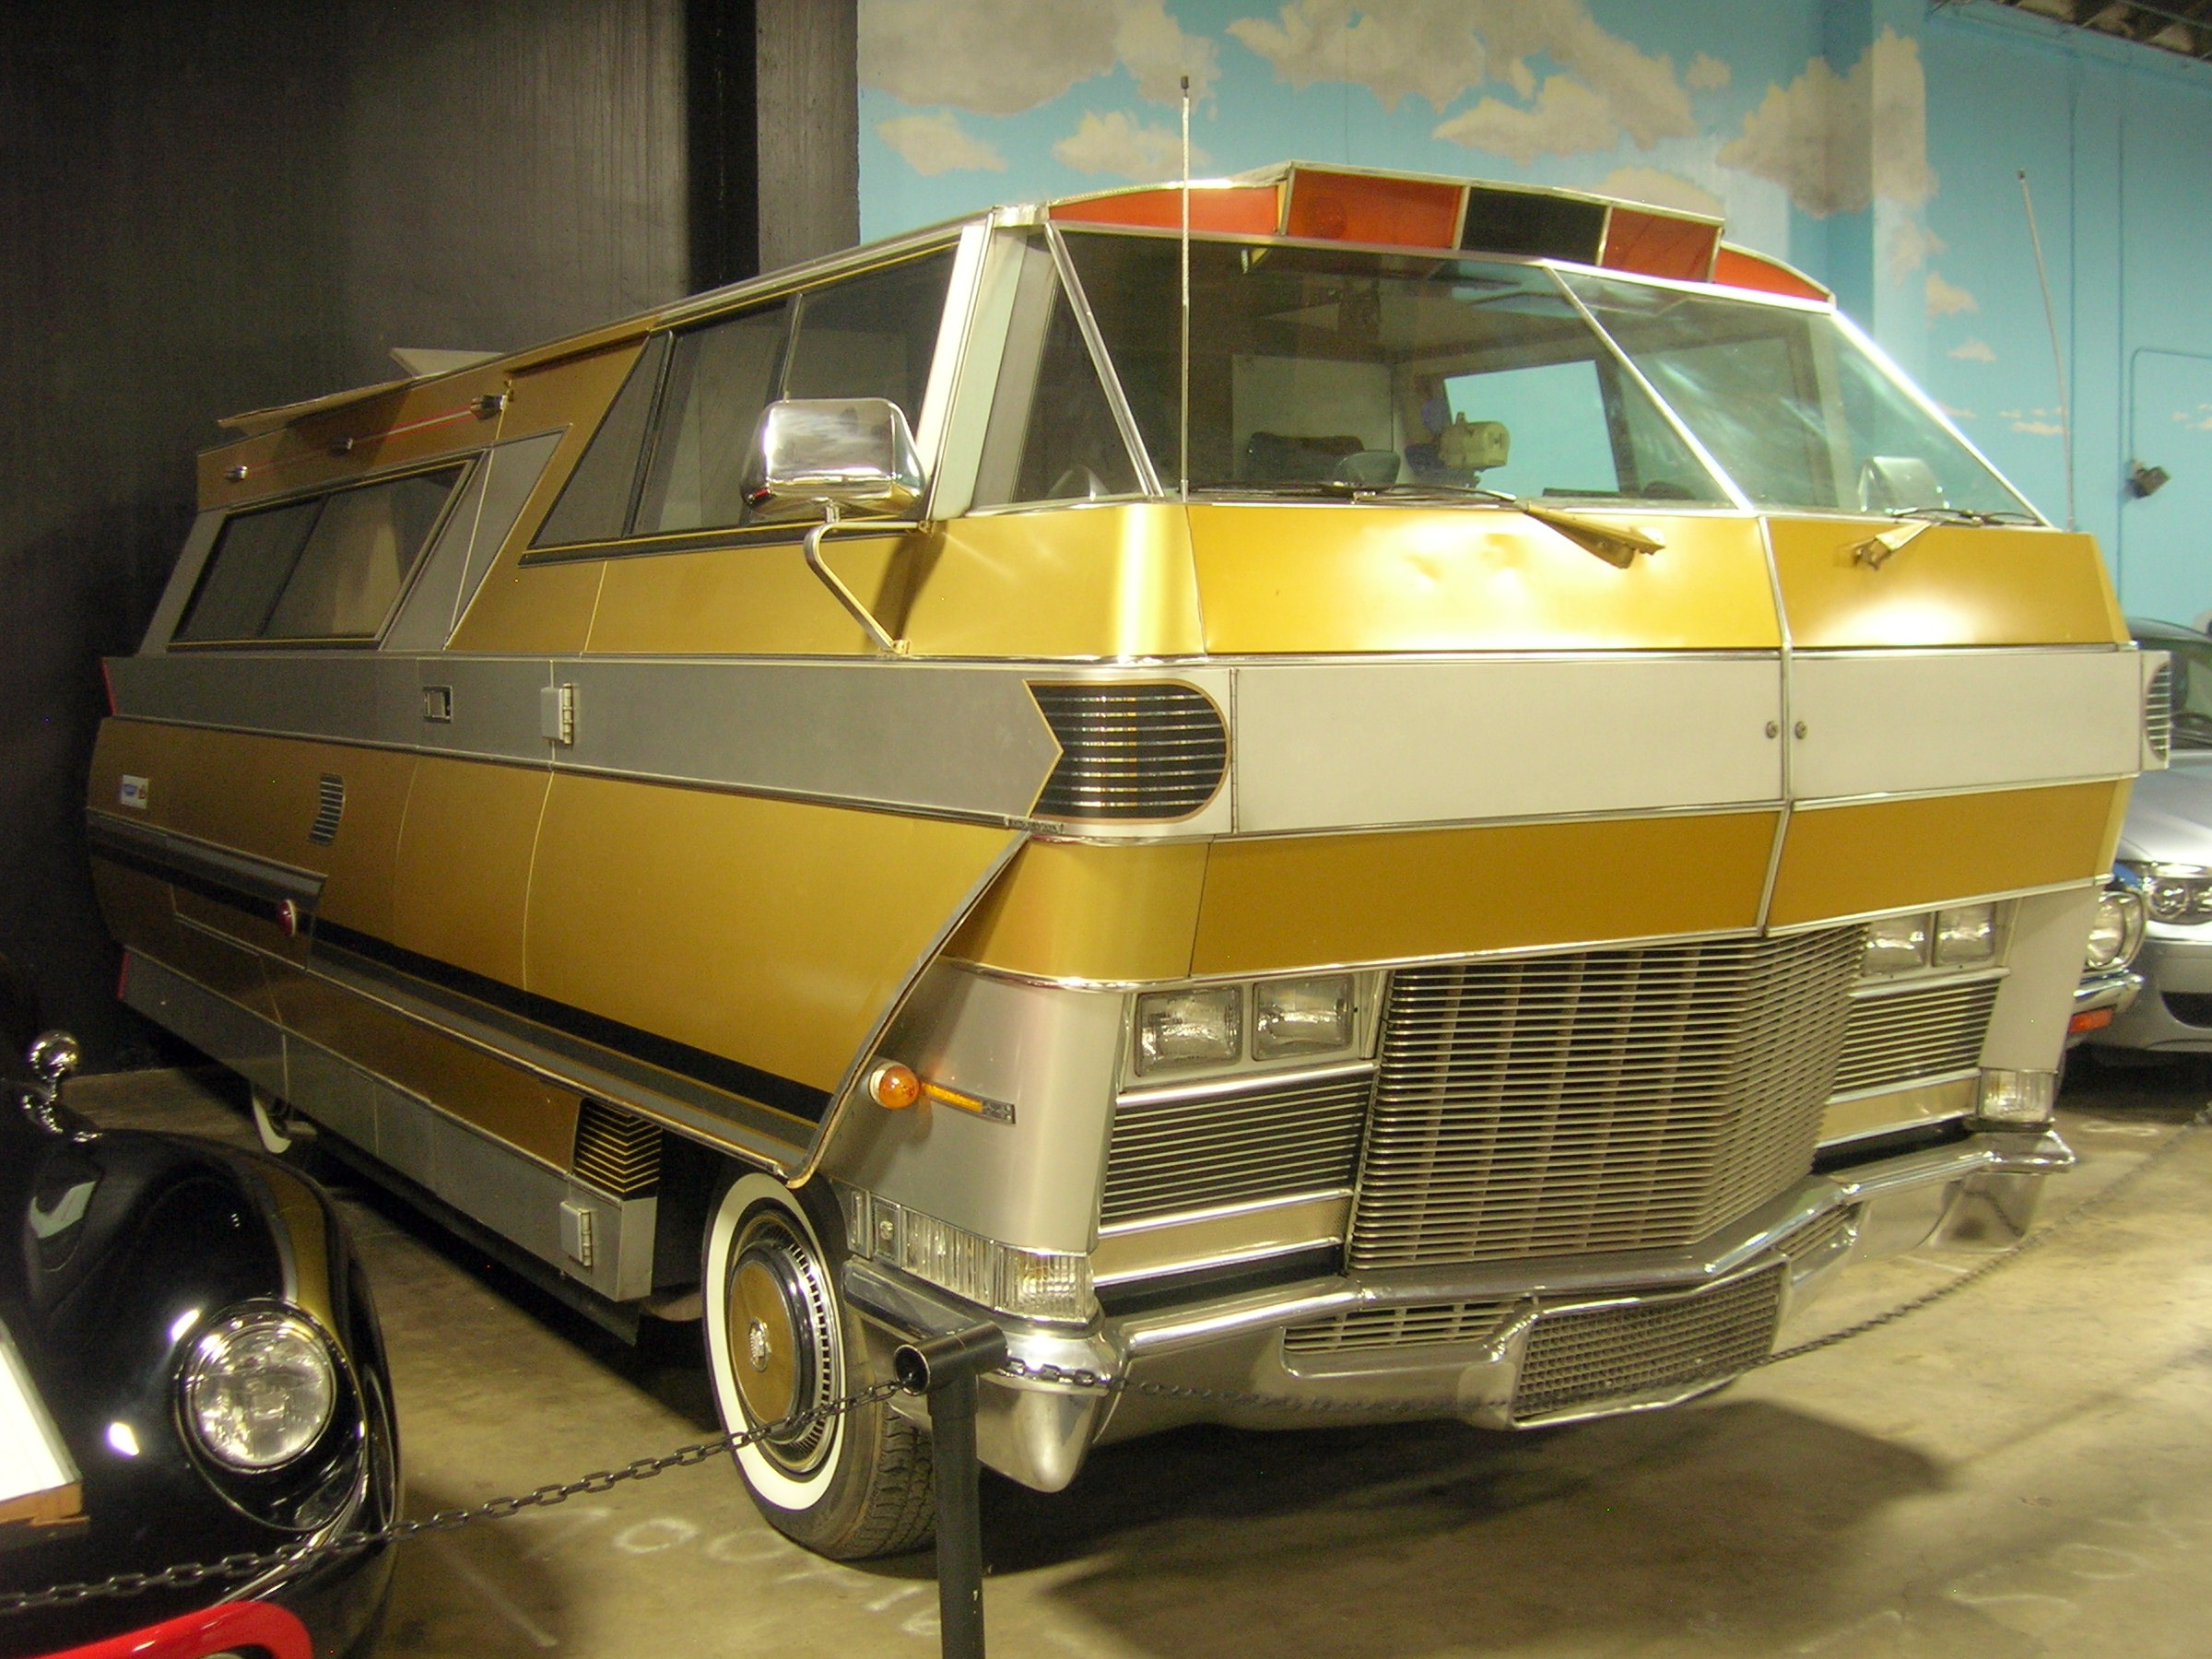 1971 Starstreak Motorhome.jpg